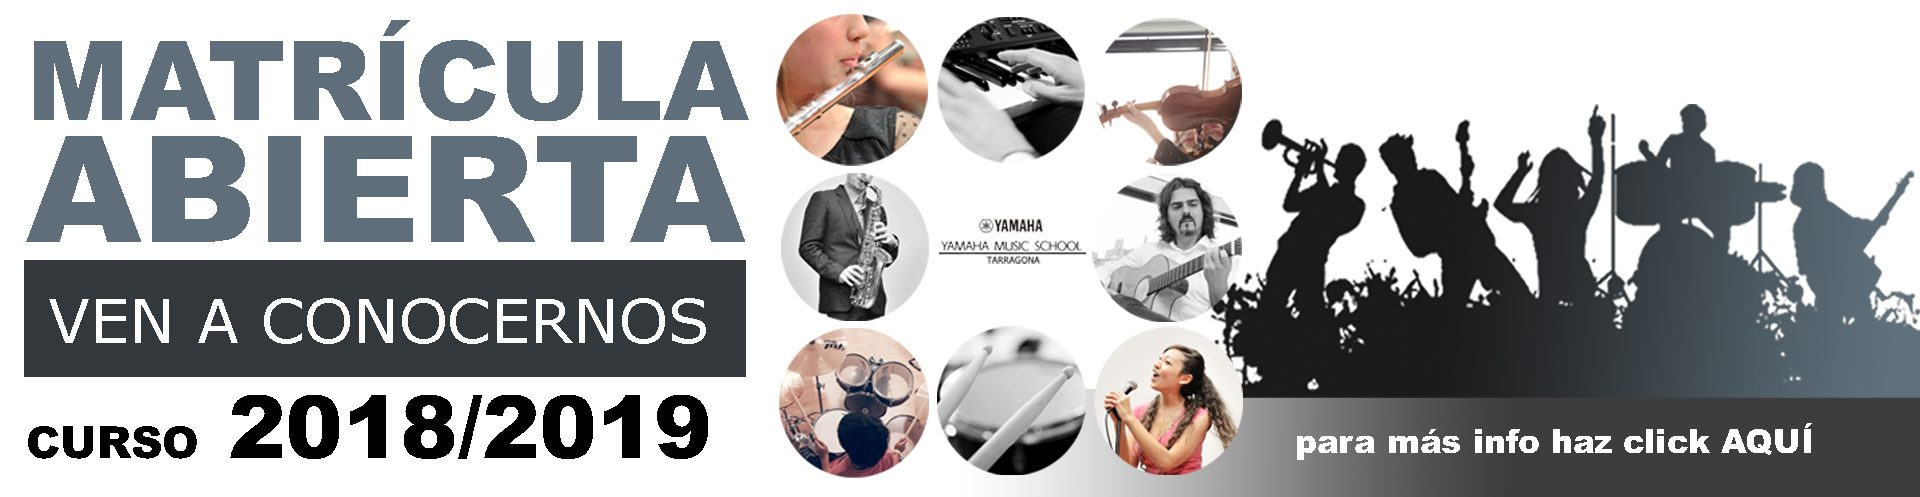 M s instrumentos j venes y adultos yamaha music school for Yamaha music school los angeles